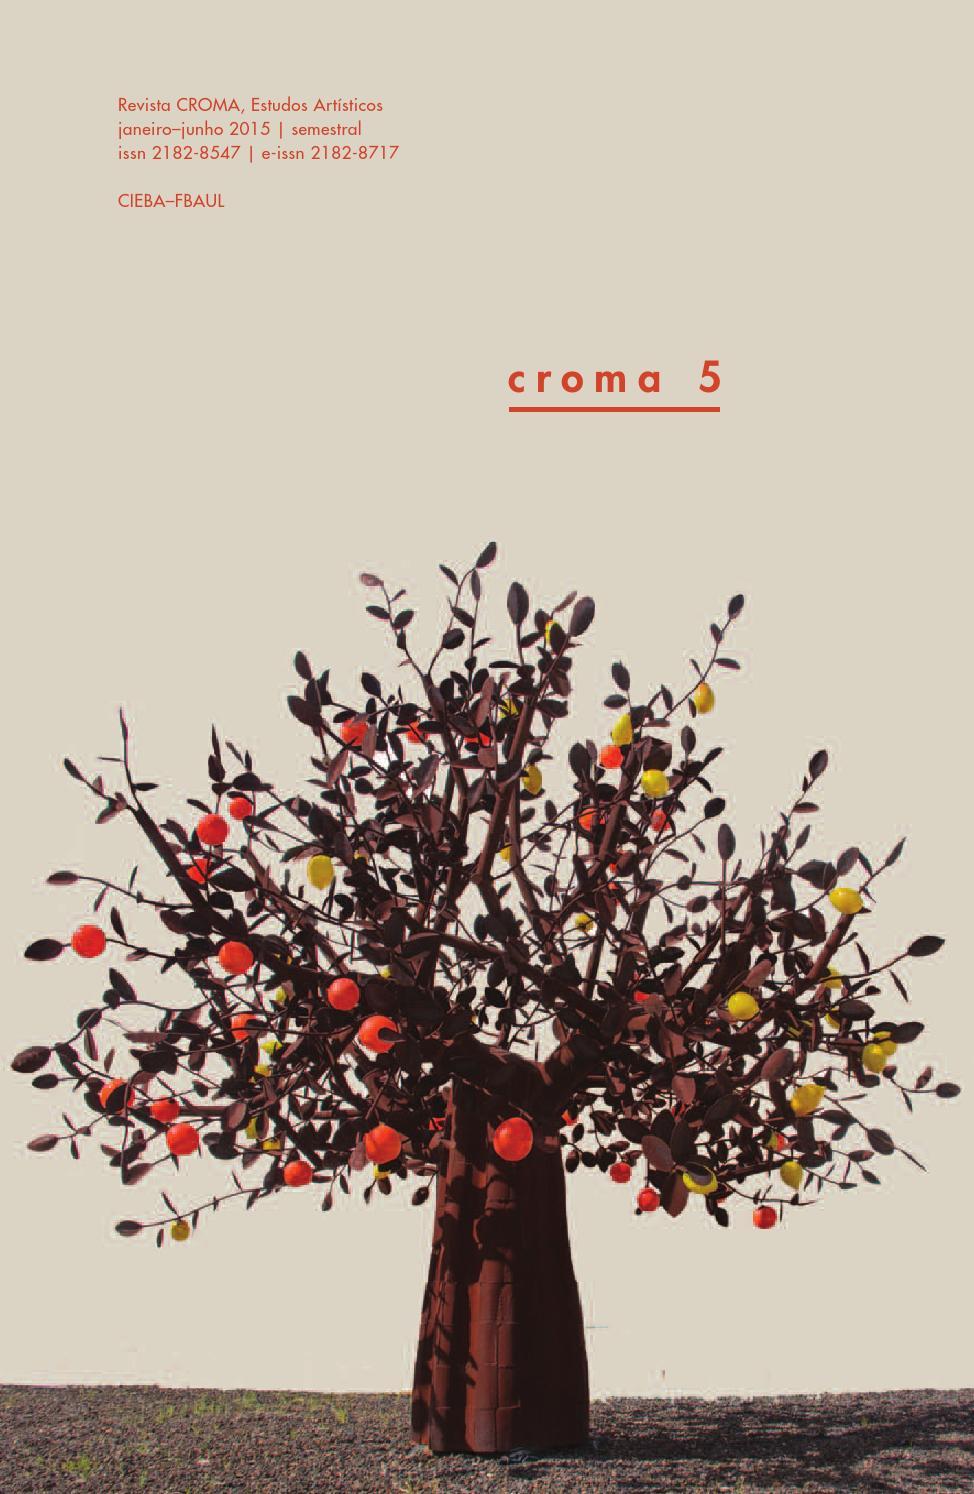 CROMA 5 by belas-artes ulisboa - issuu efe428598b180